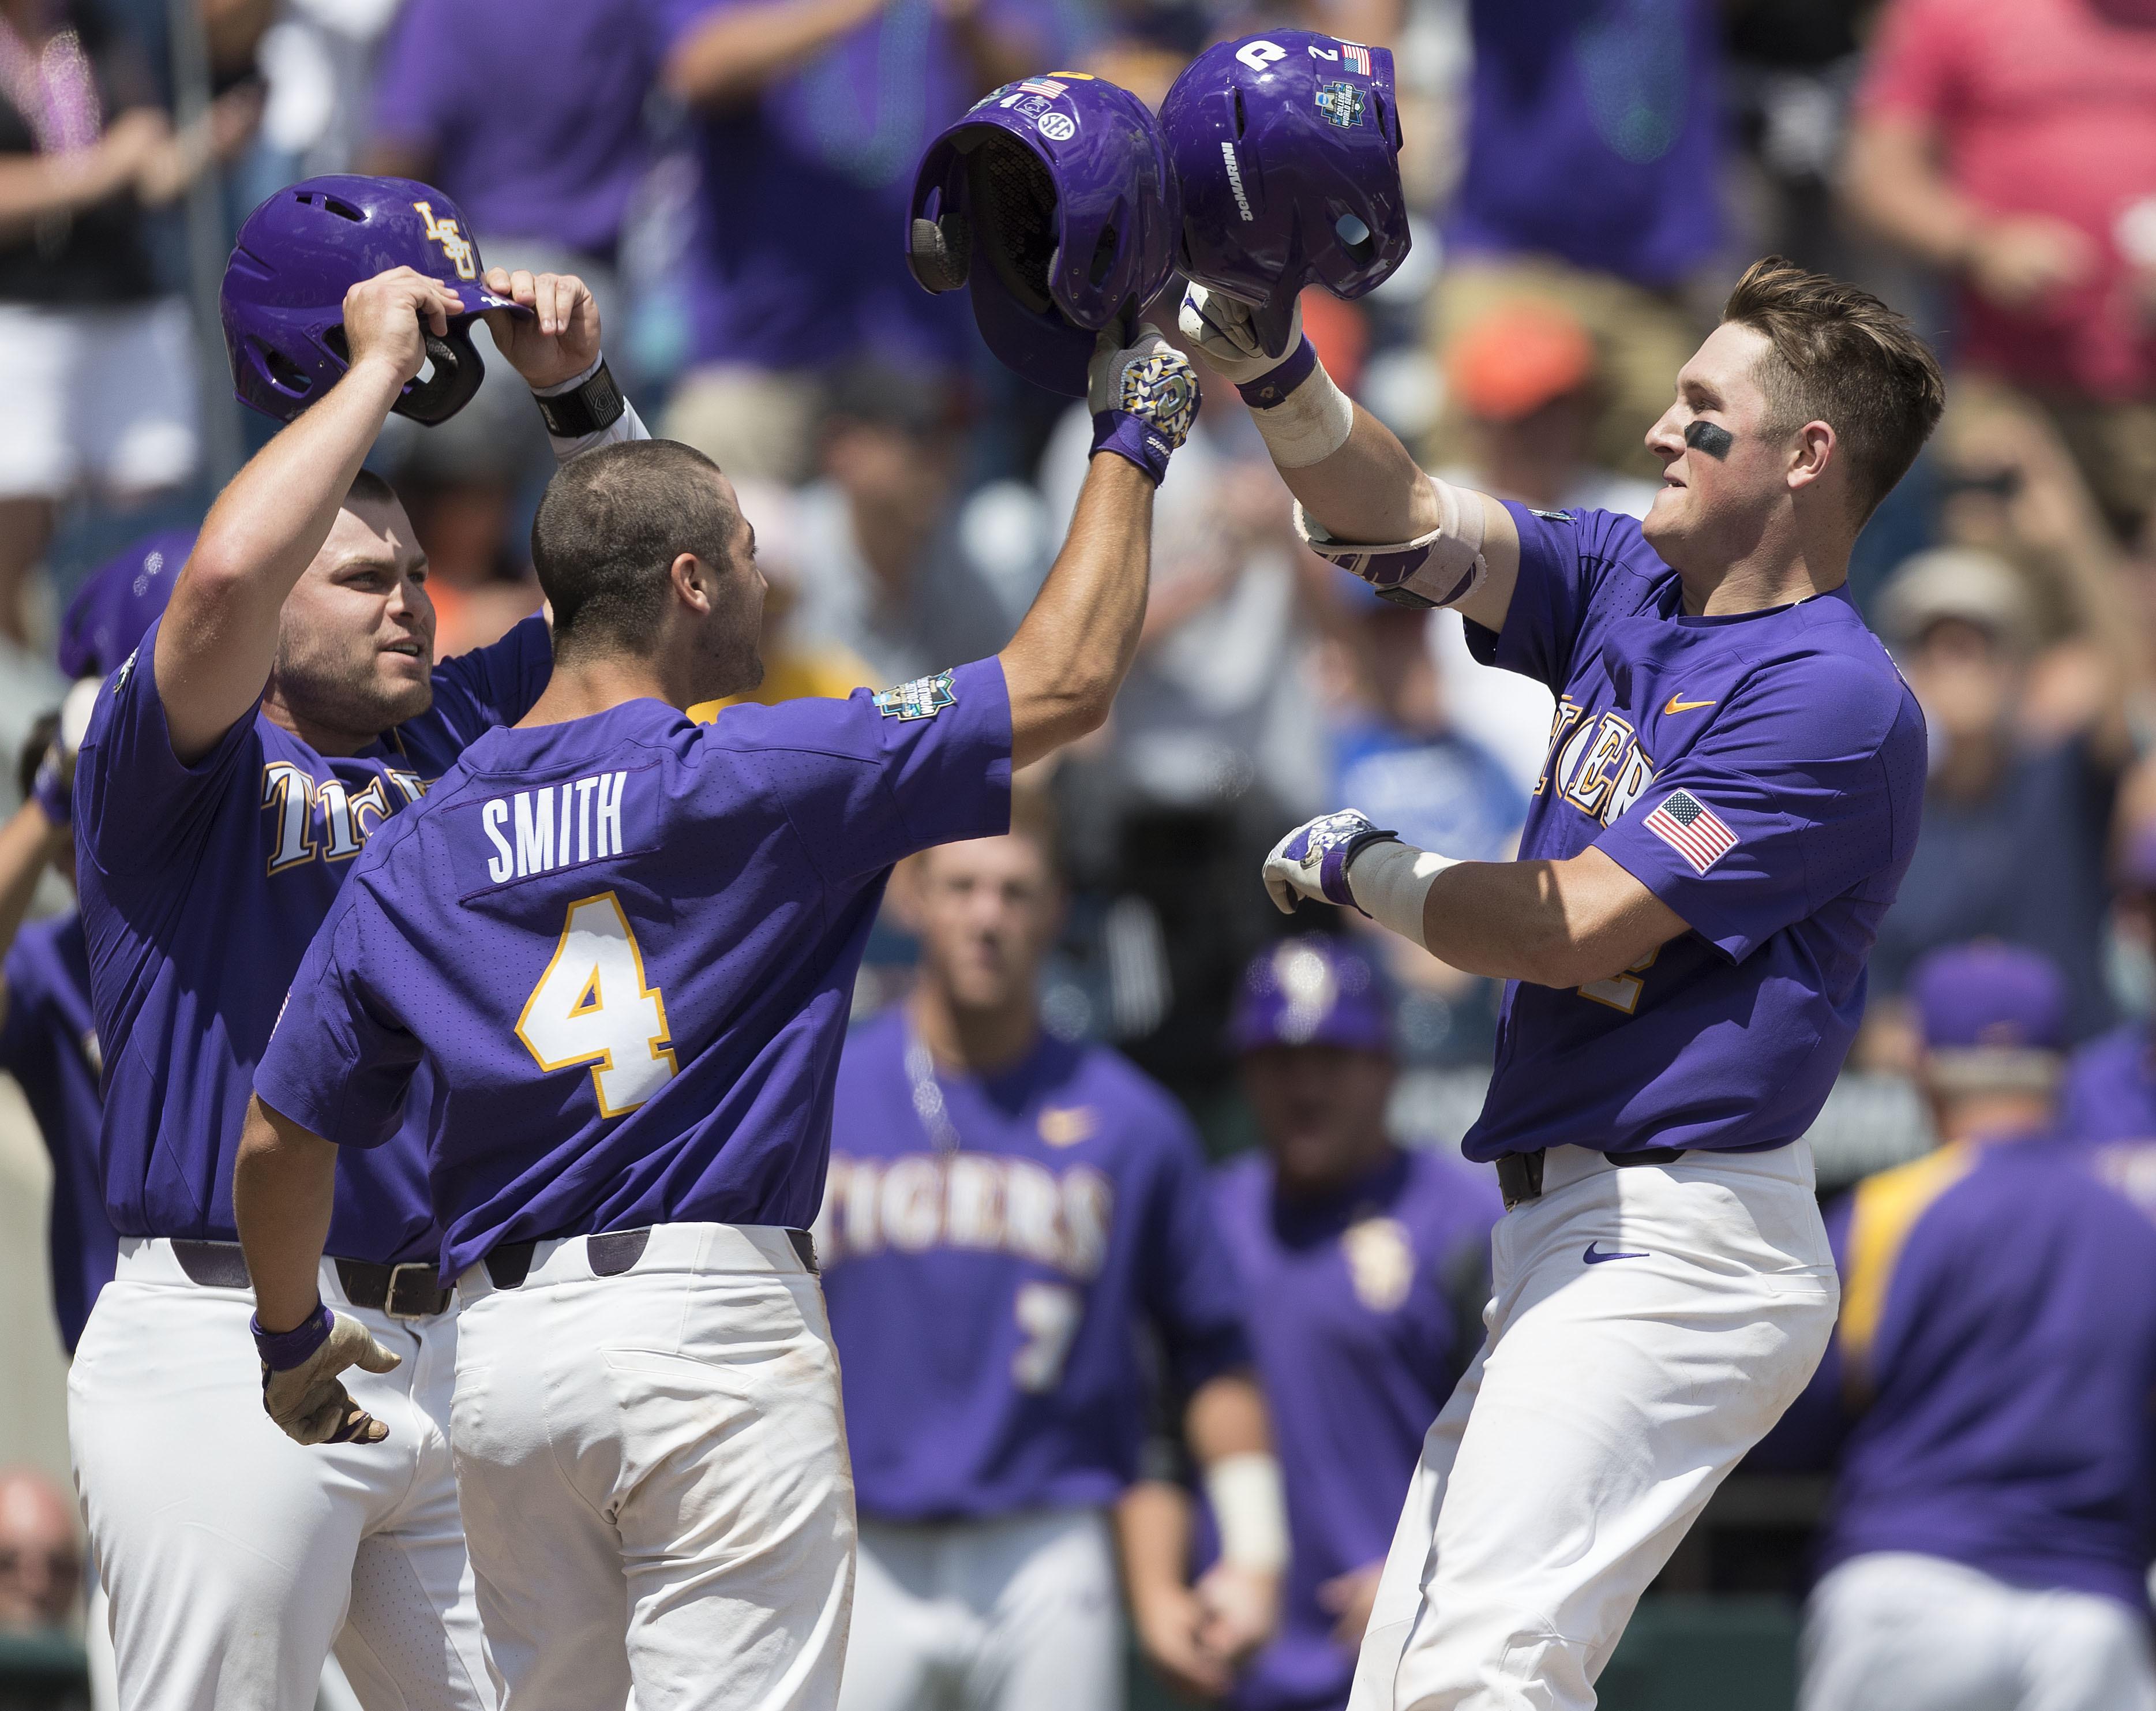 LSU advances to College World Series Finals